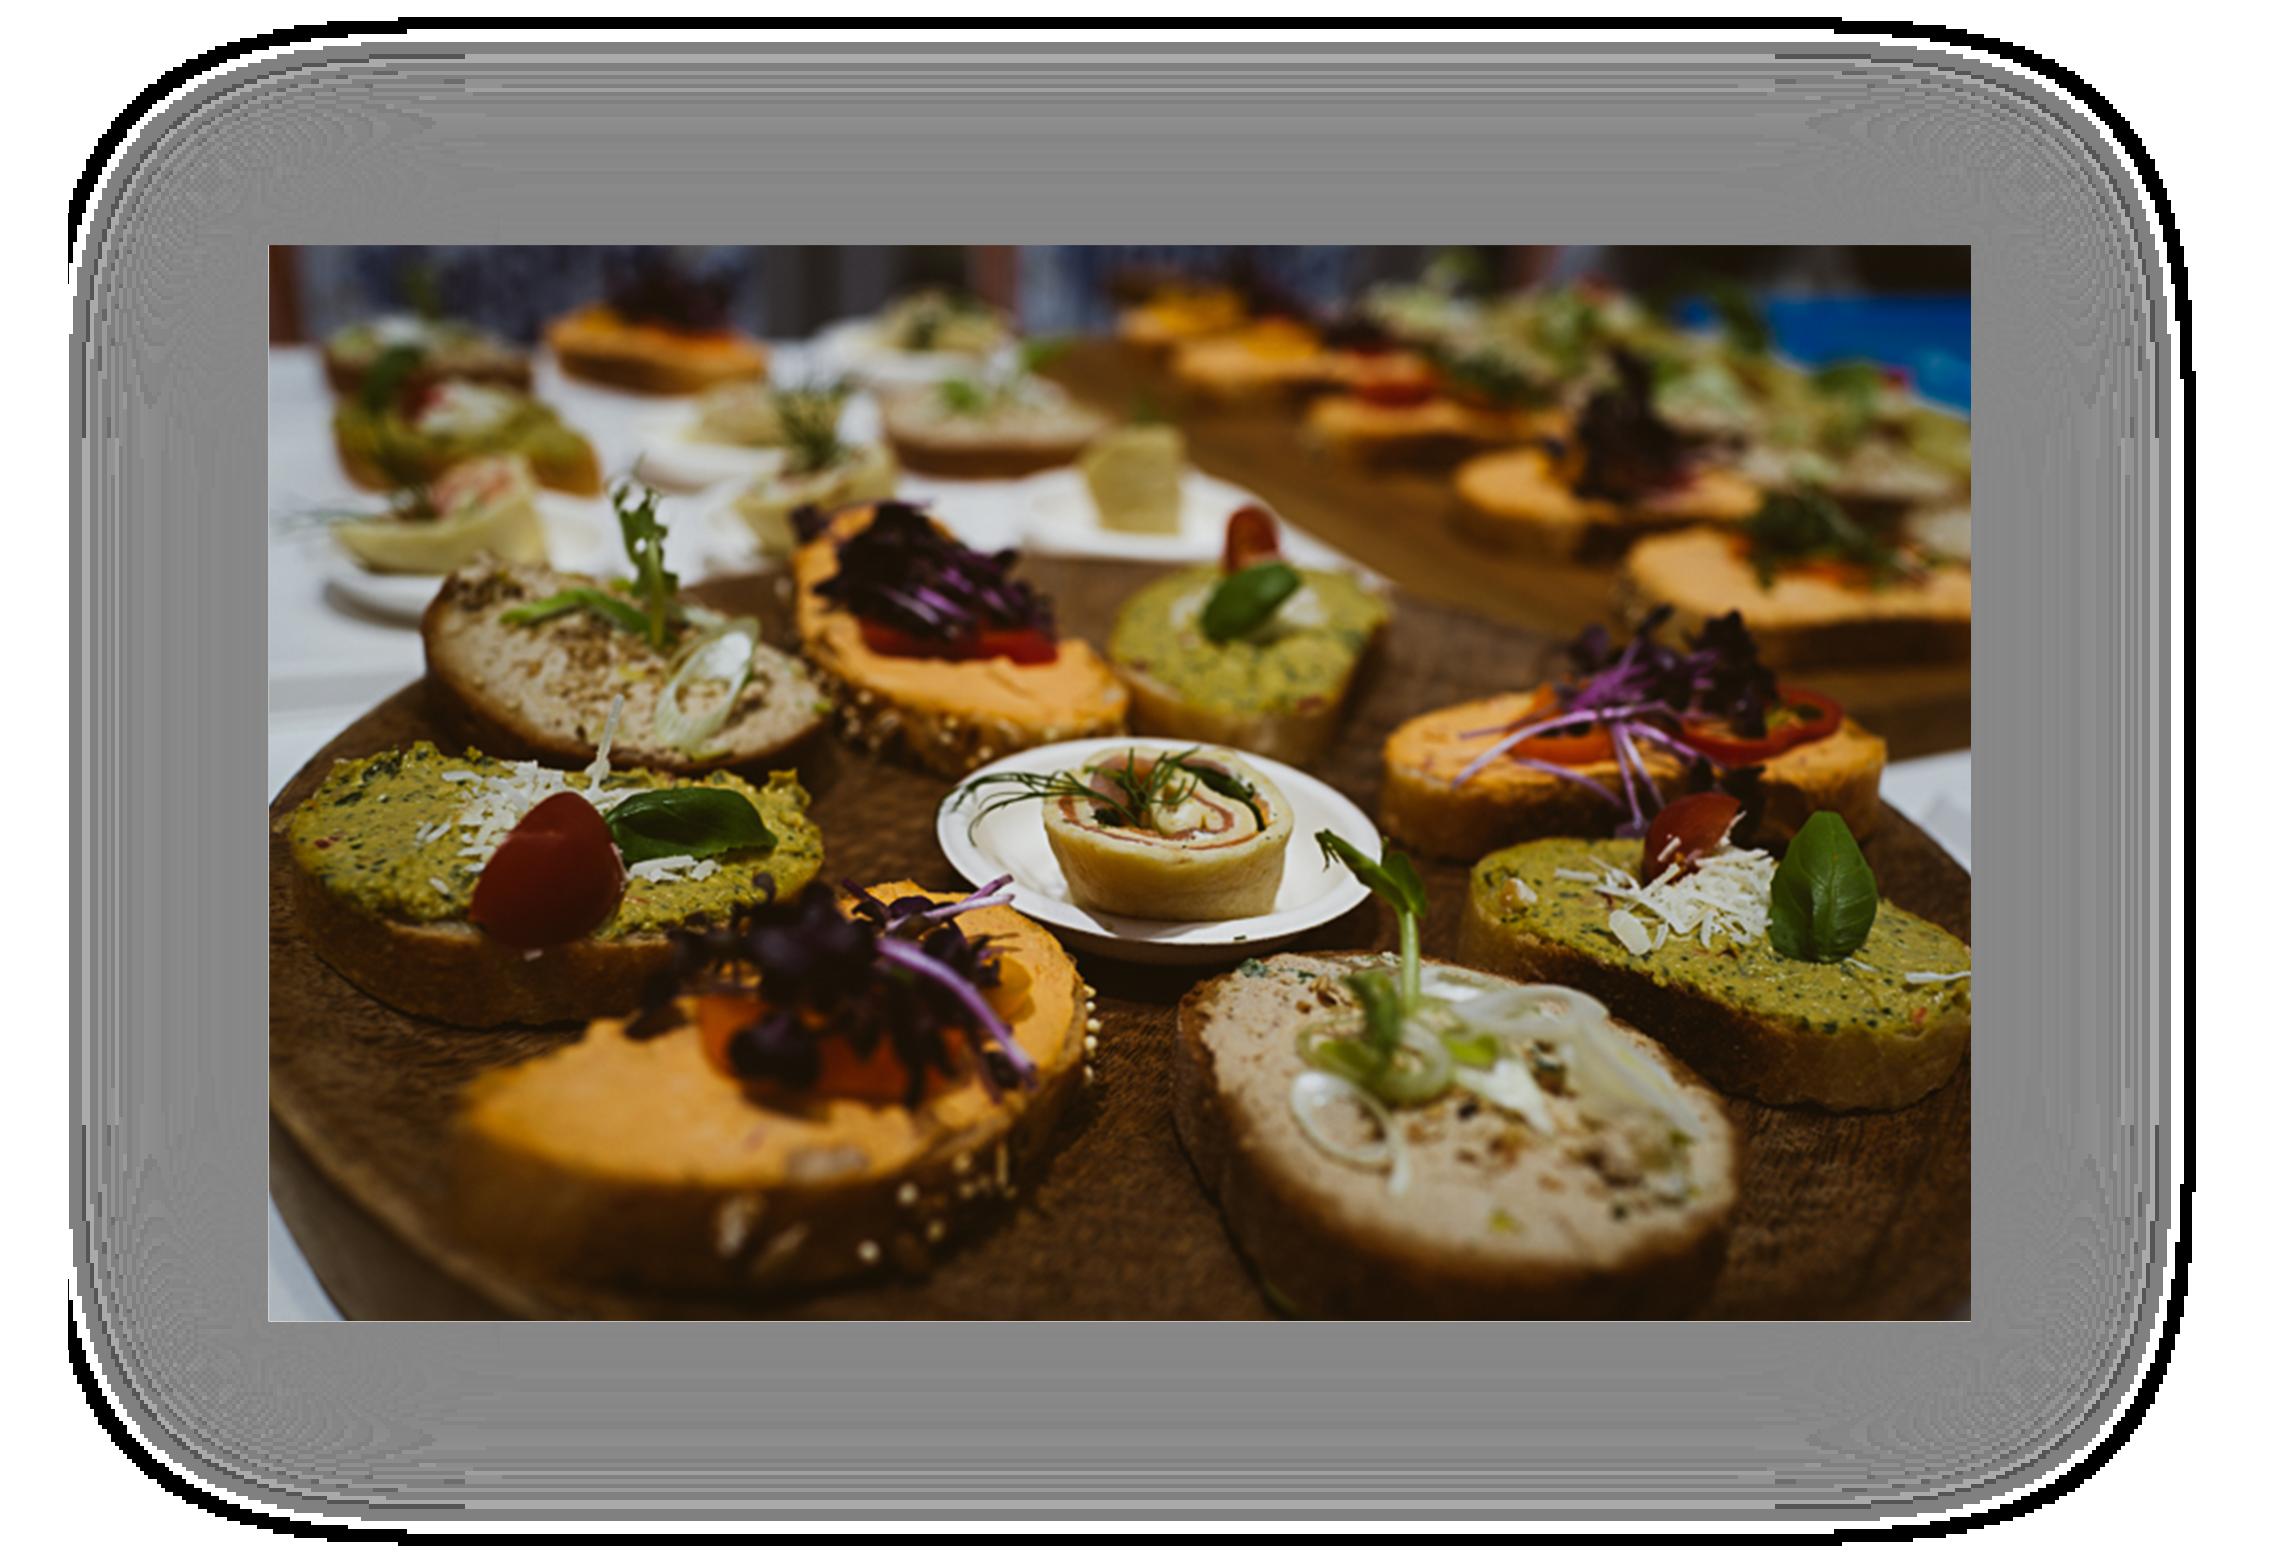 canape catering bayreuth impressionen